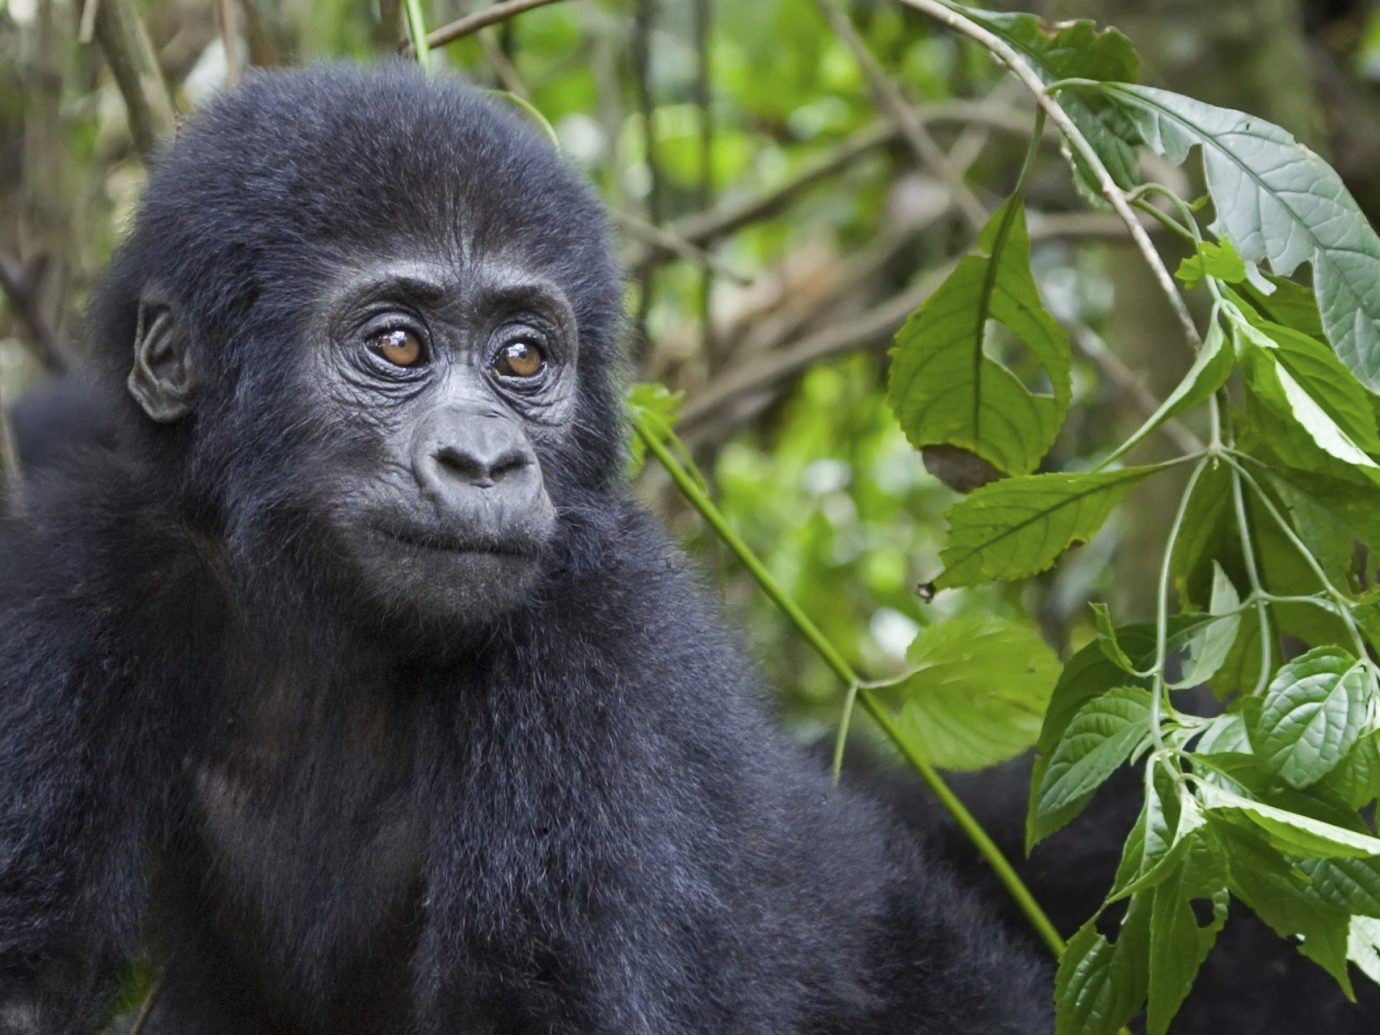 Trip Ideas mammal primate animal tree outdoor western gorilla vertebrate great ape black ape Wildlife fauna plant new world monkey zoo chimpanzee common chimpanzee Jungle gray